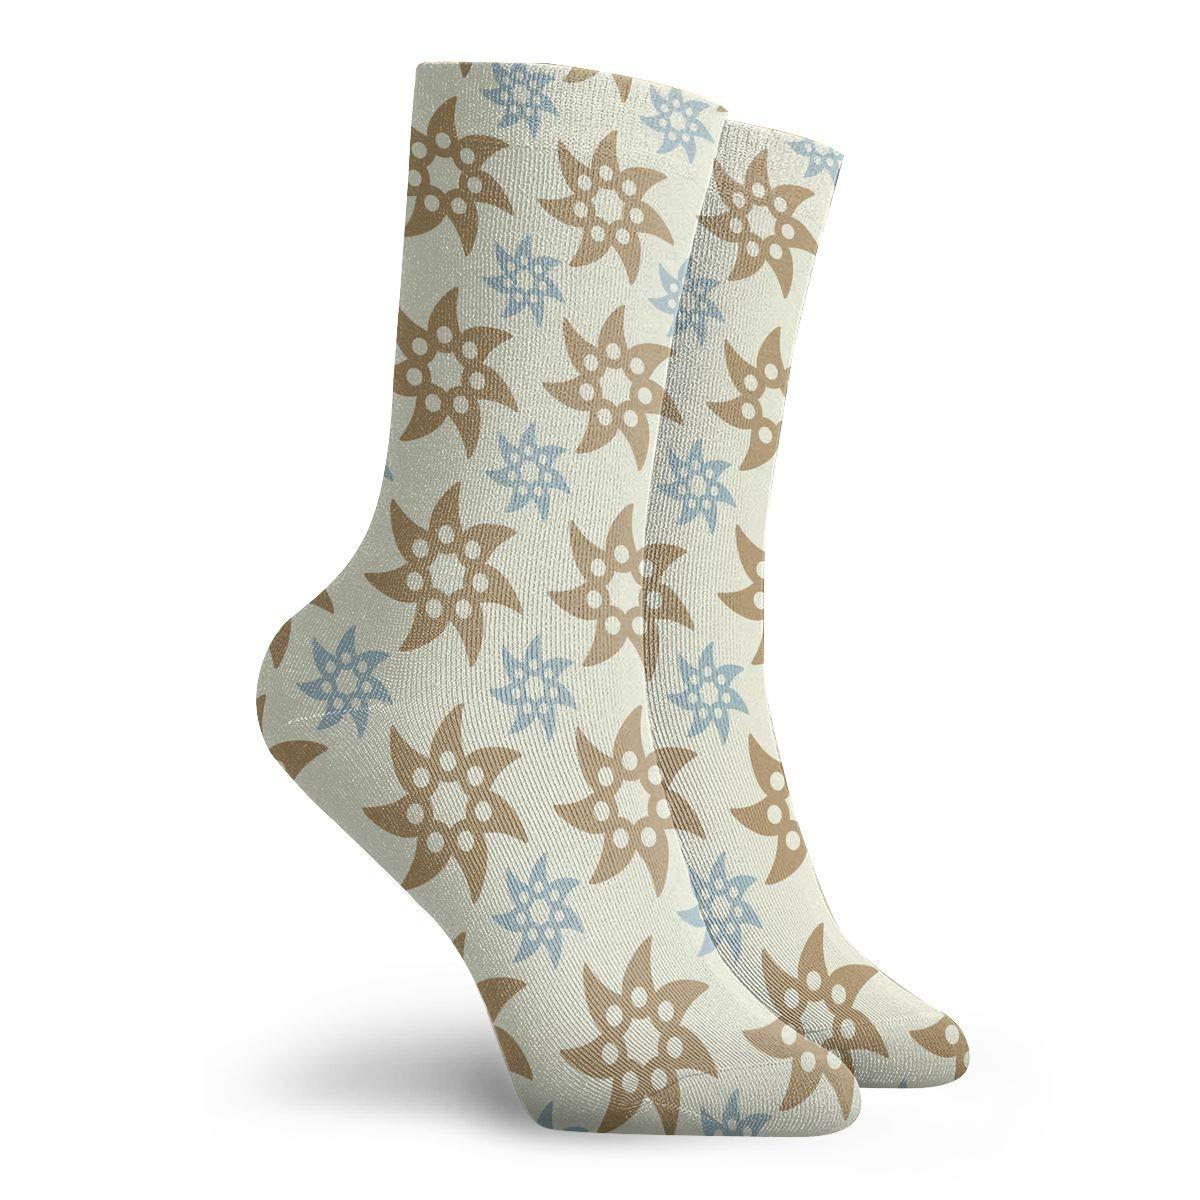 Adult Ninja Throwing Star Pattern Athletic Ankle Socks